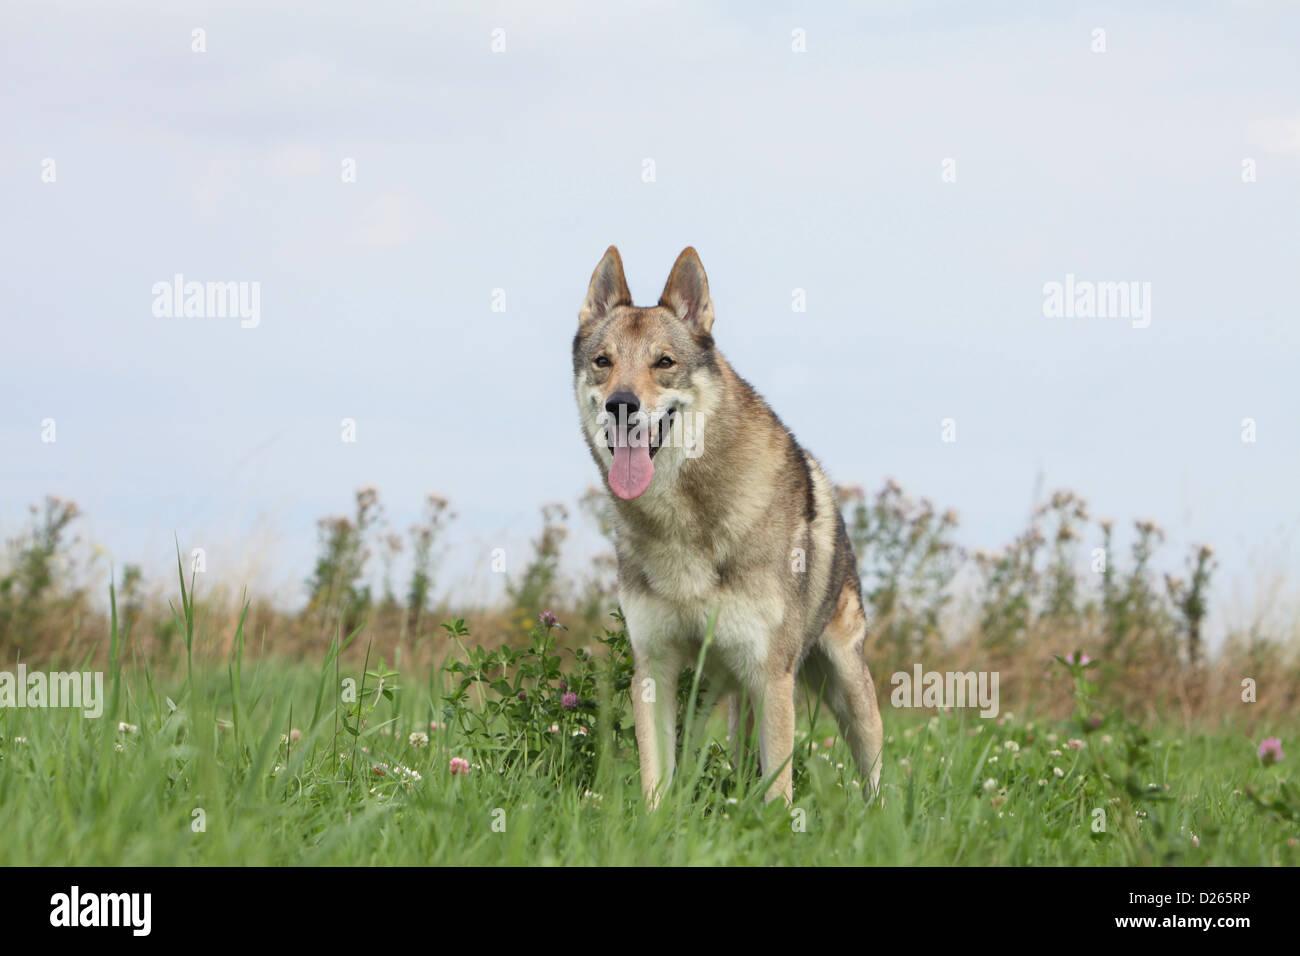 Dog Czechoslovakian wolfdog / Tschechoslowakischer Wolfhund adult standing - Stock Image